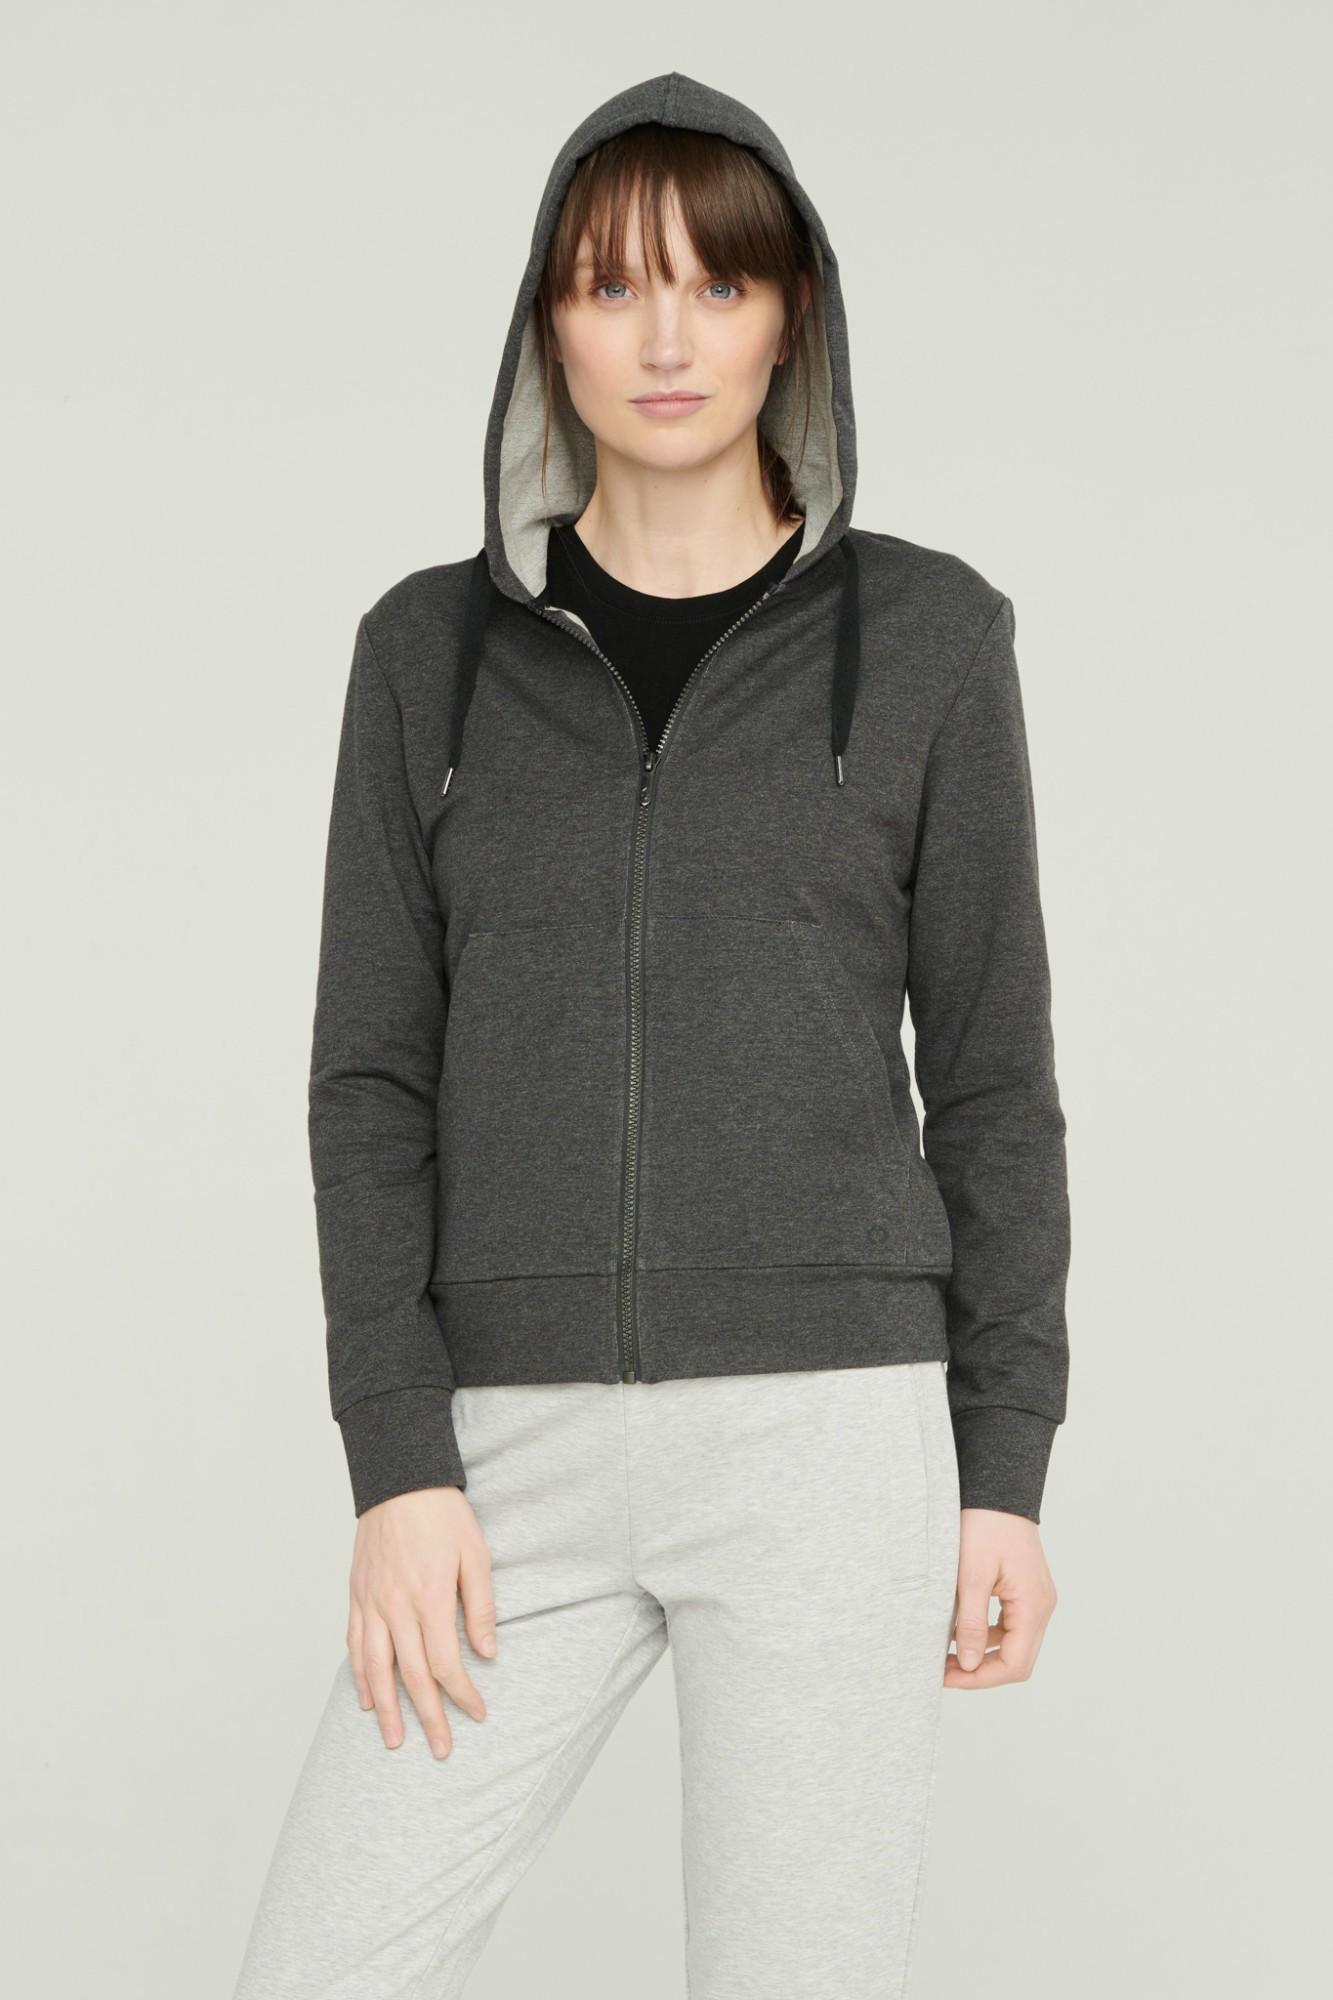 AUDIMAS Atsegamas medv. džemp. su gobtuvu 2111-062 Dark Grey Melange S